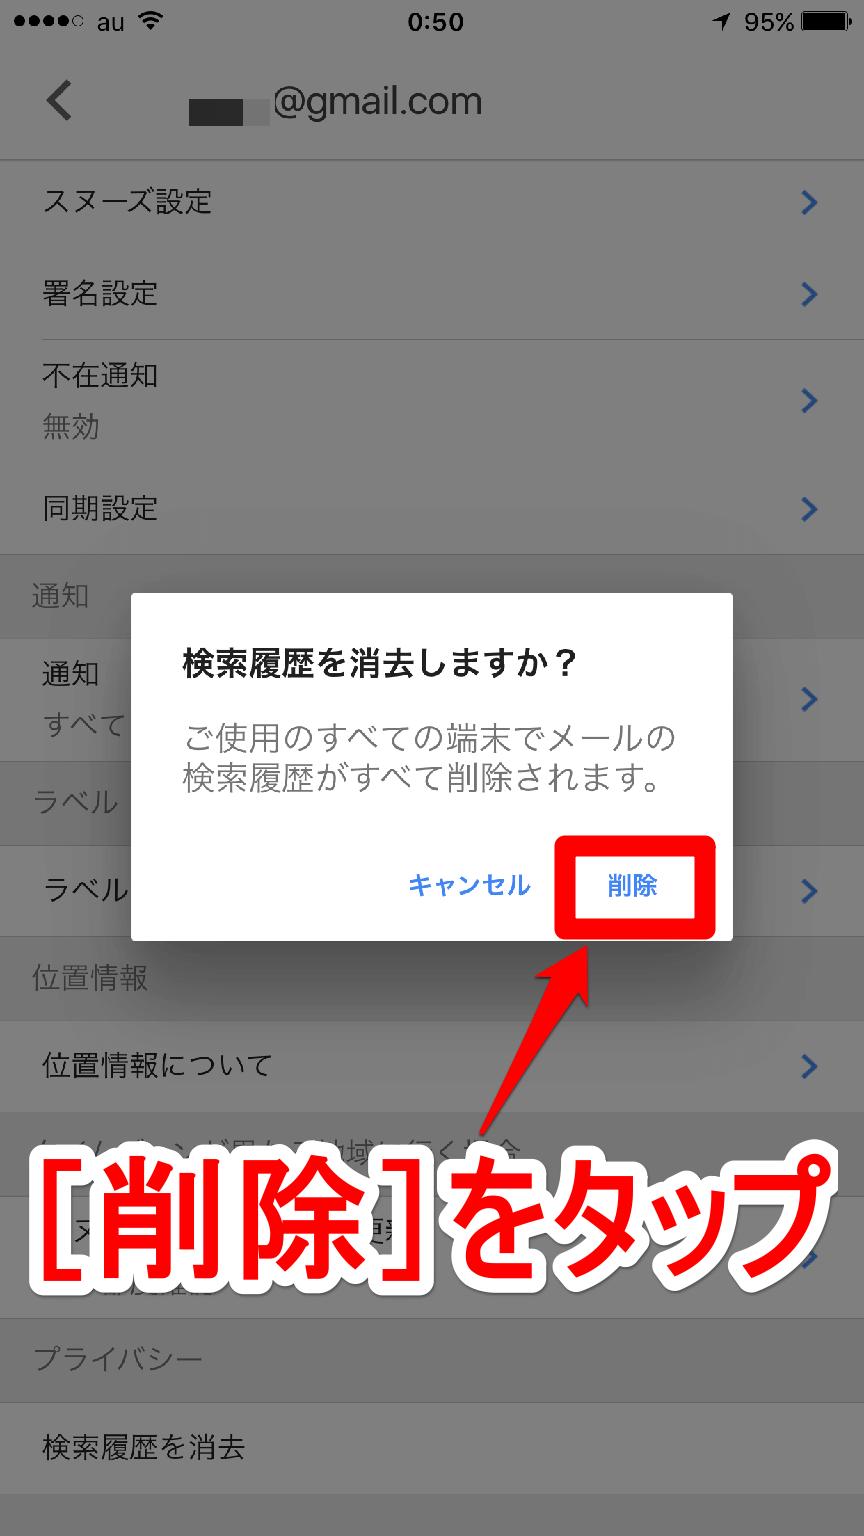 iPhone(アイフォン/アイフォーン)版Inbox(インボックス)アプリの検索履歴消去の確認画面